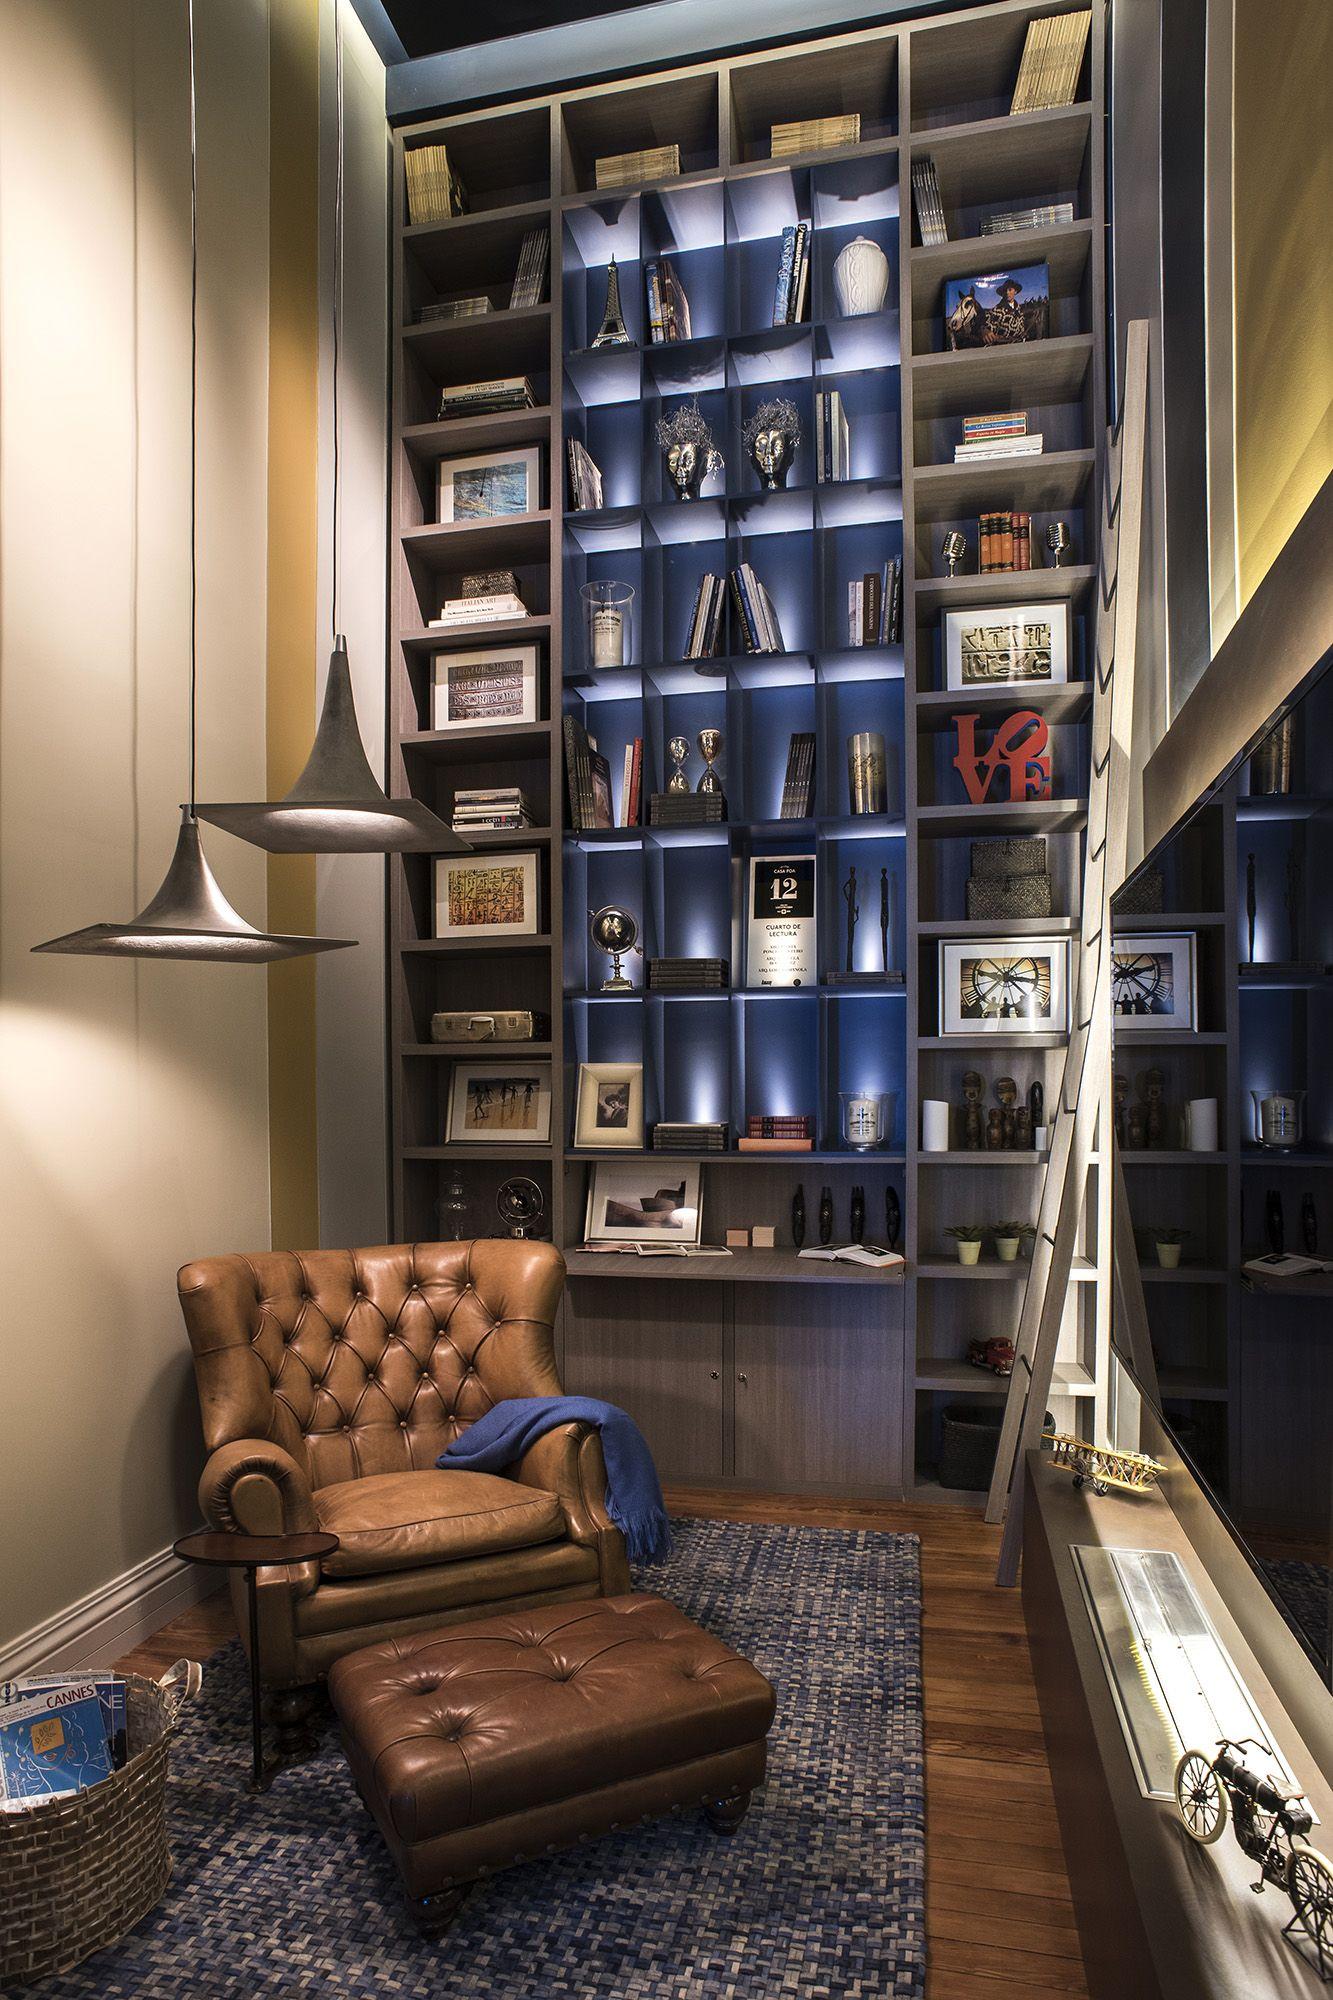 12 Masisa Casa Foa 2015 Dise O Interiores Pinterest  # Muebles Casa Foa